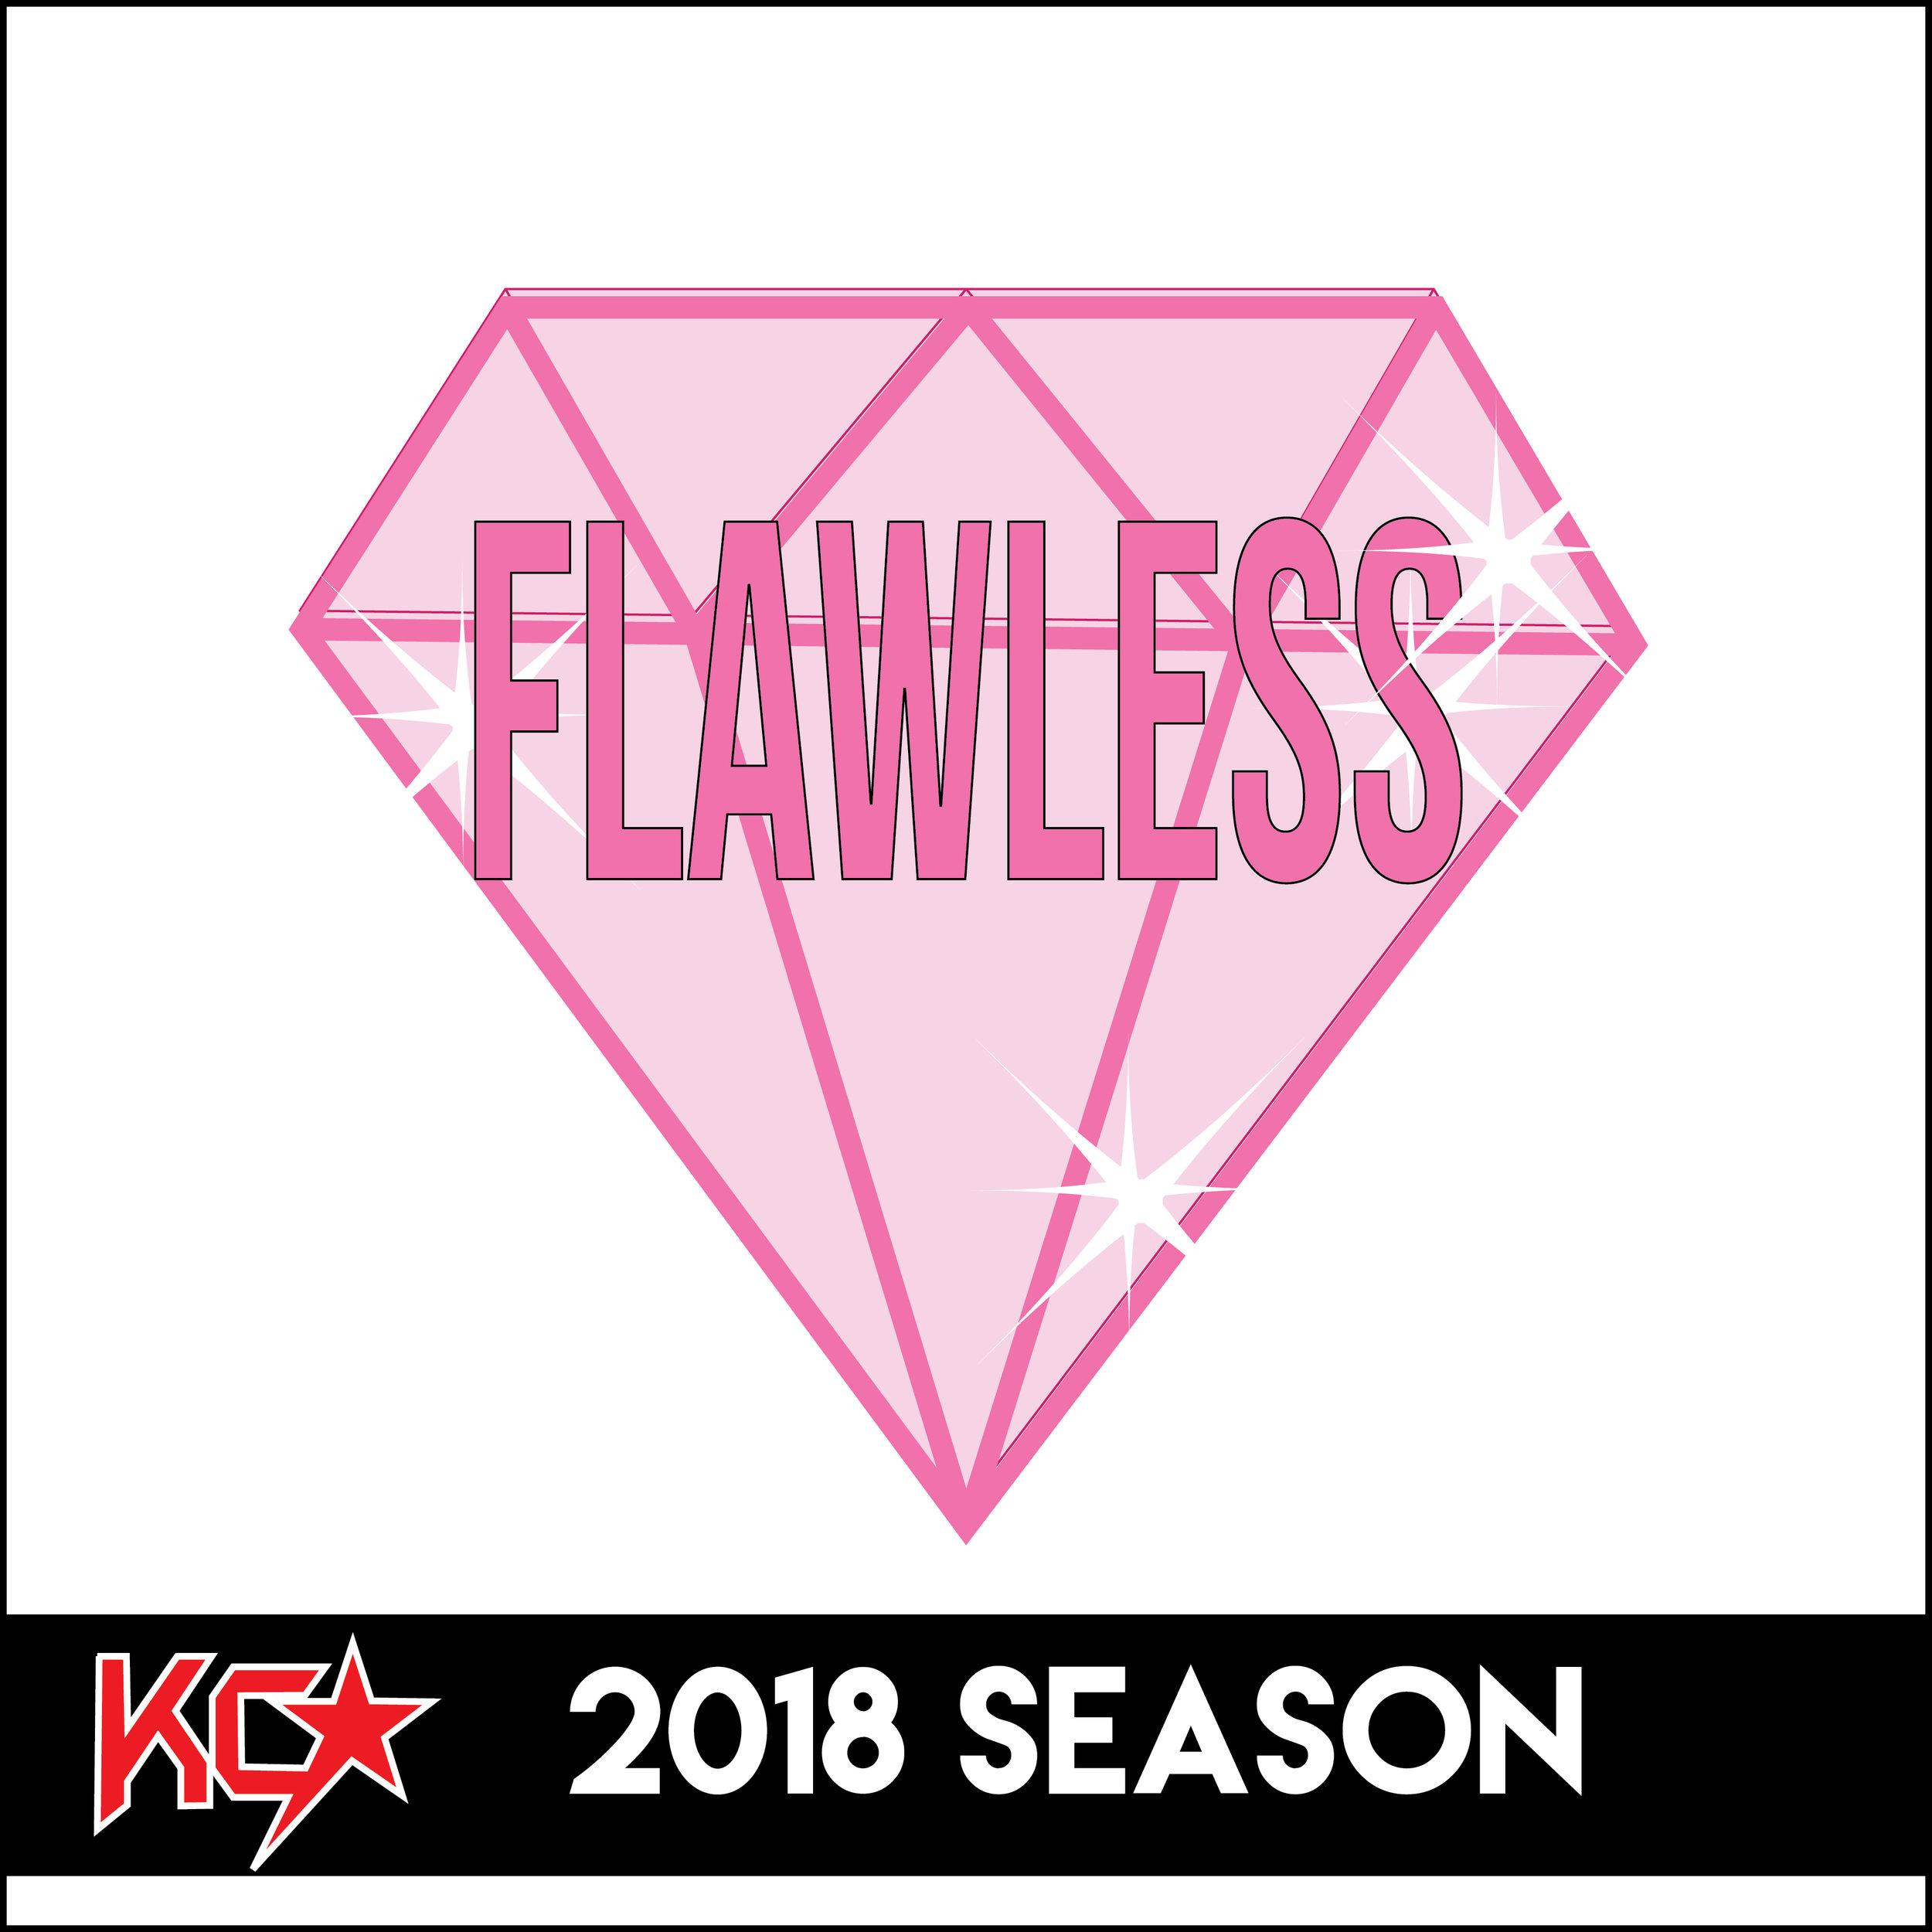 08 flawless-01.jpg